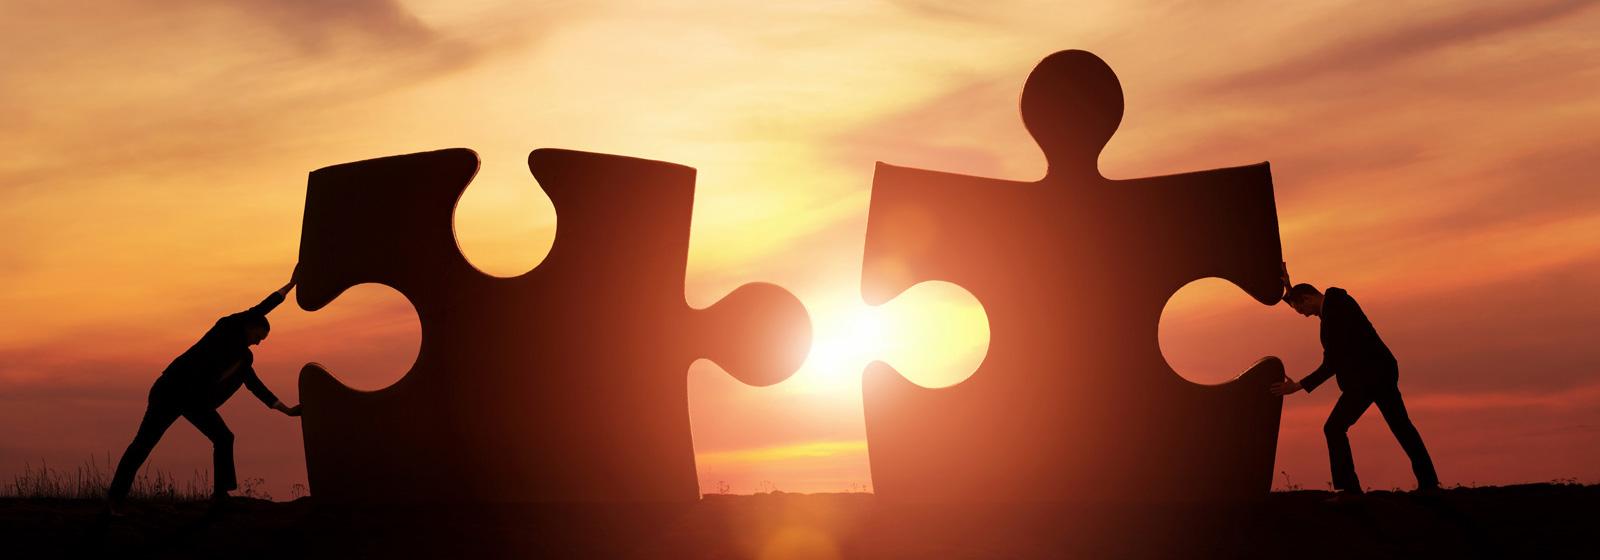 Job Twinning: samen werken aan<br/>professionele ontwikkeling